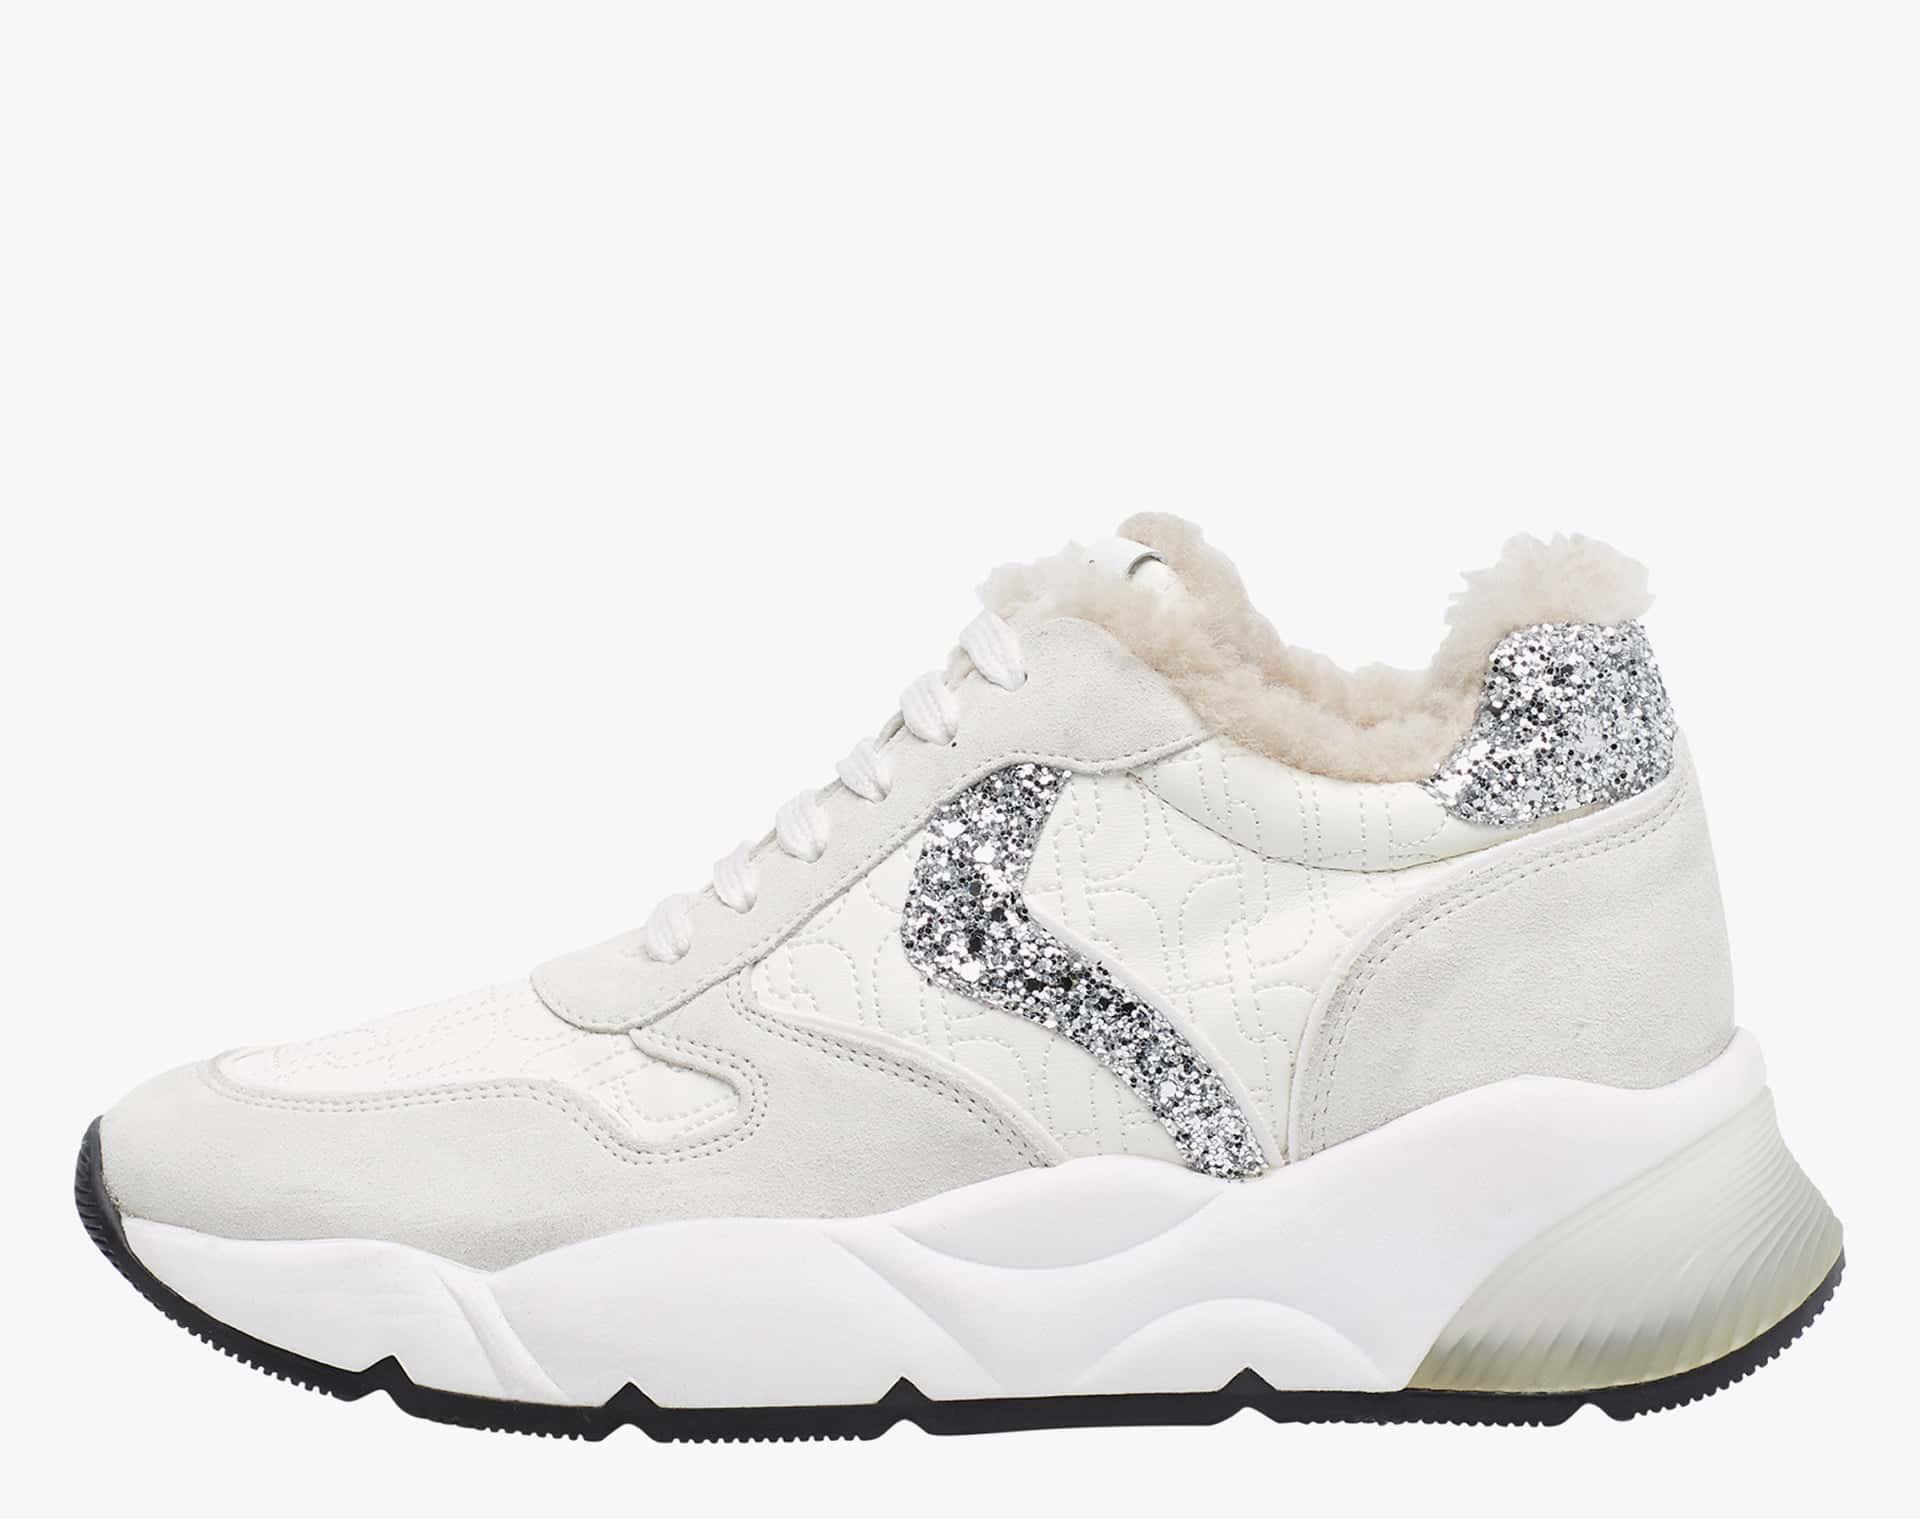 SHEEL FUR - Shearling lined sneaker - White/Silver